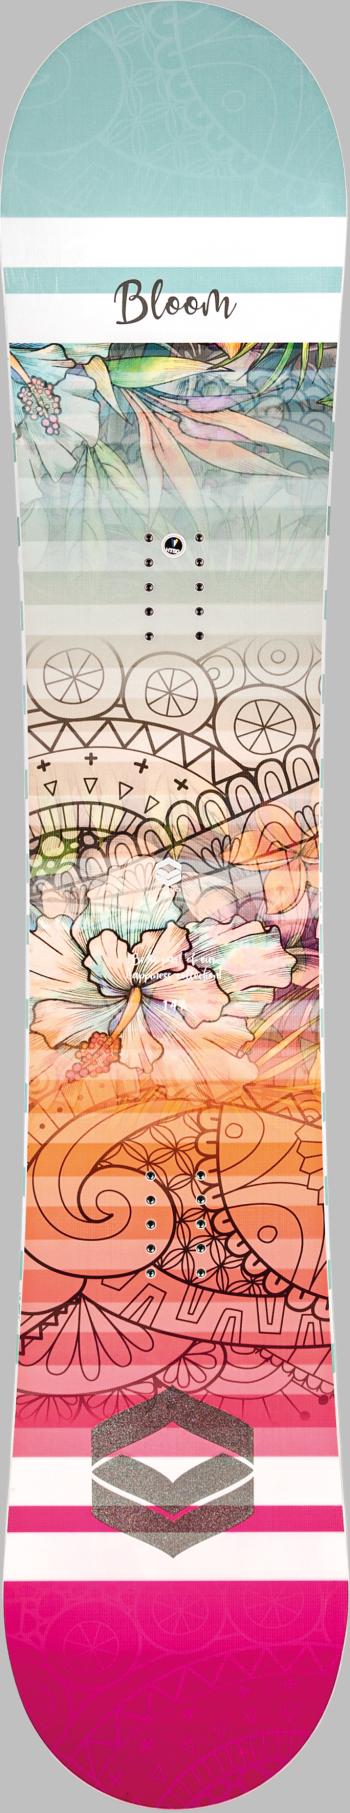 Bloom pink - Top